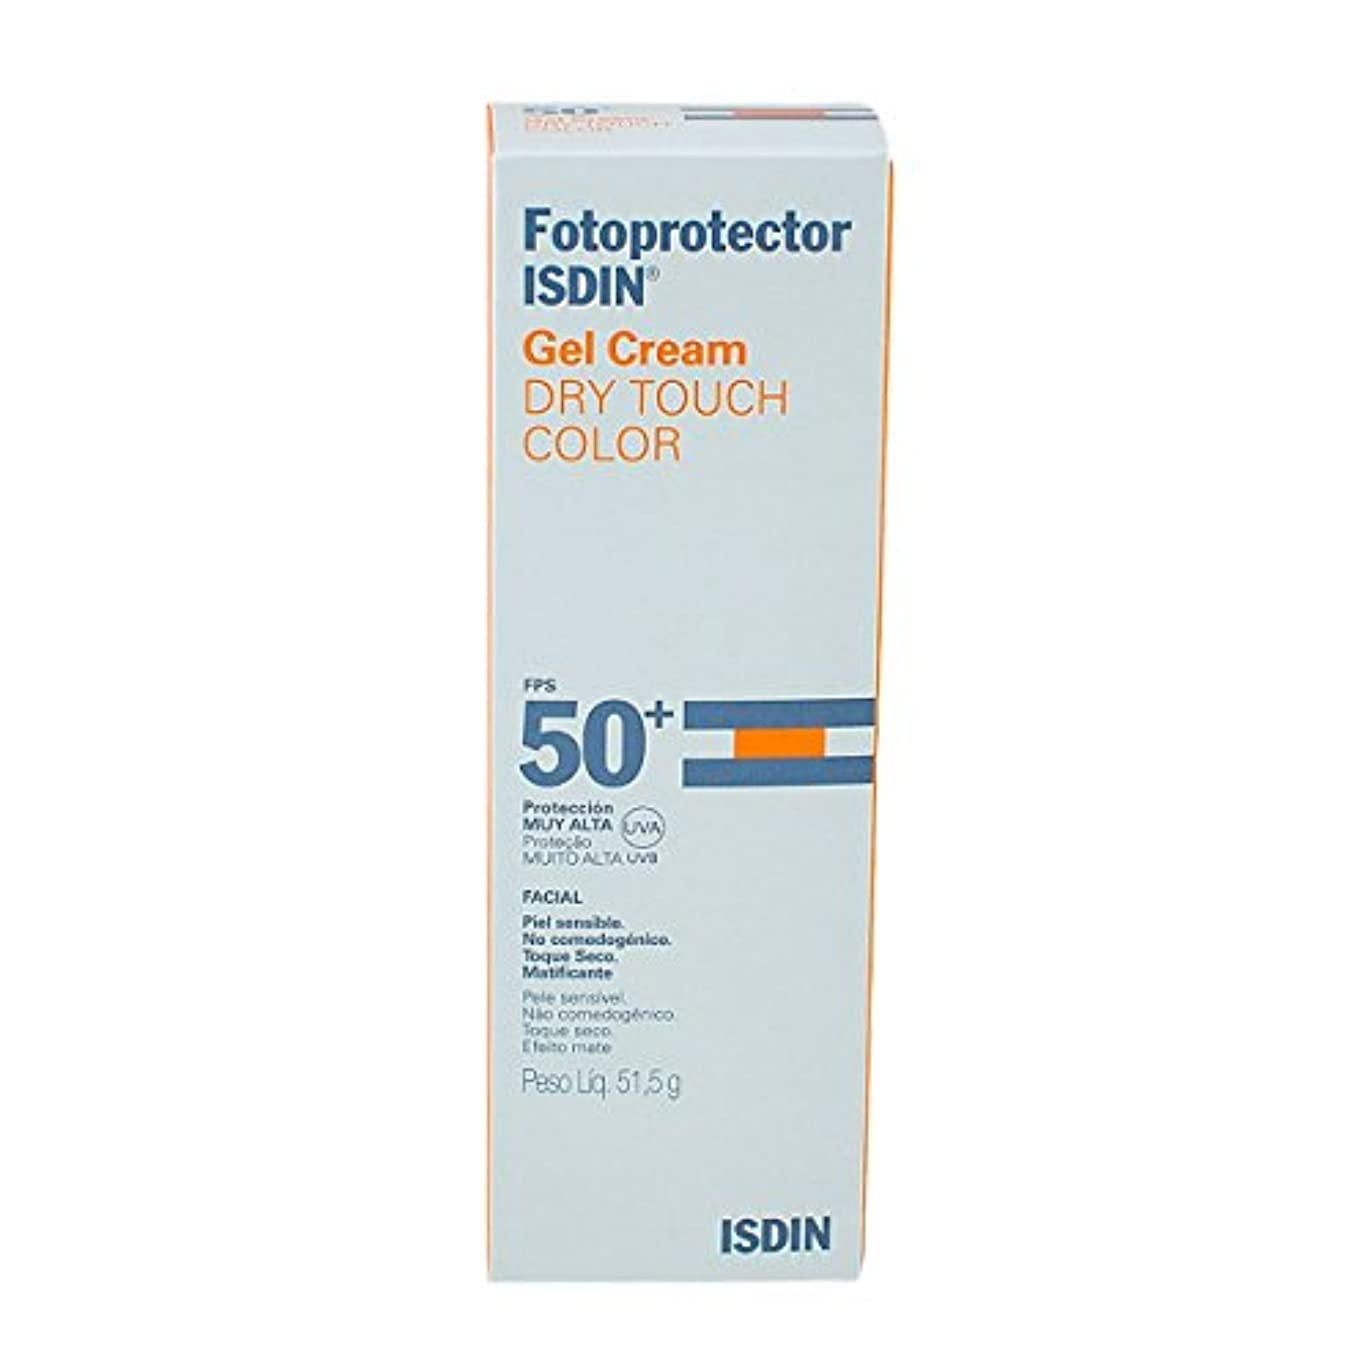 Isdin Sunscreen Gel Cream Dry Touch Color Spf50+ 50ml [並行輸入品]